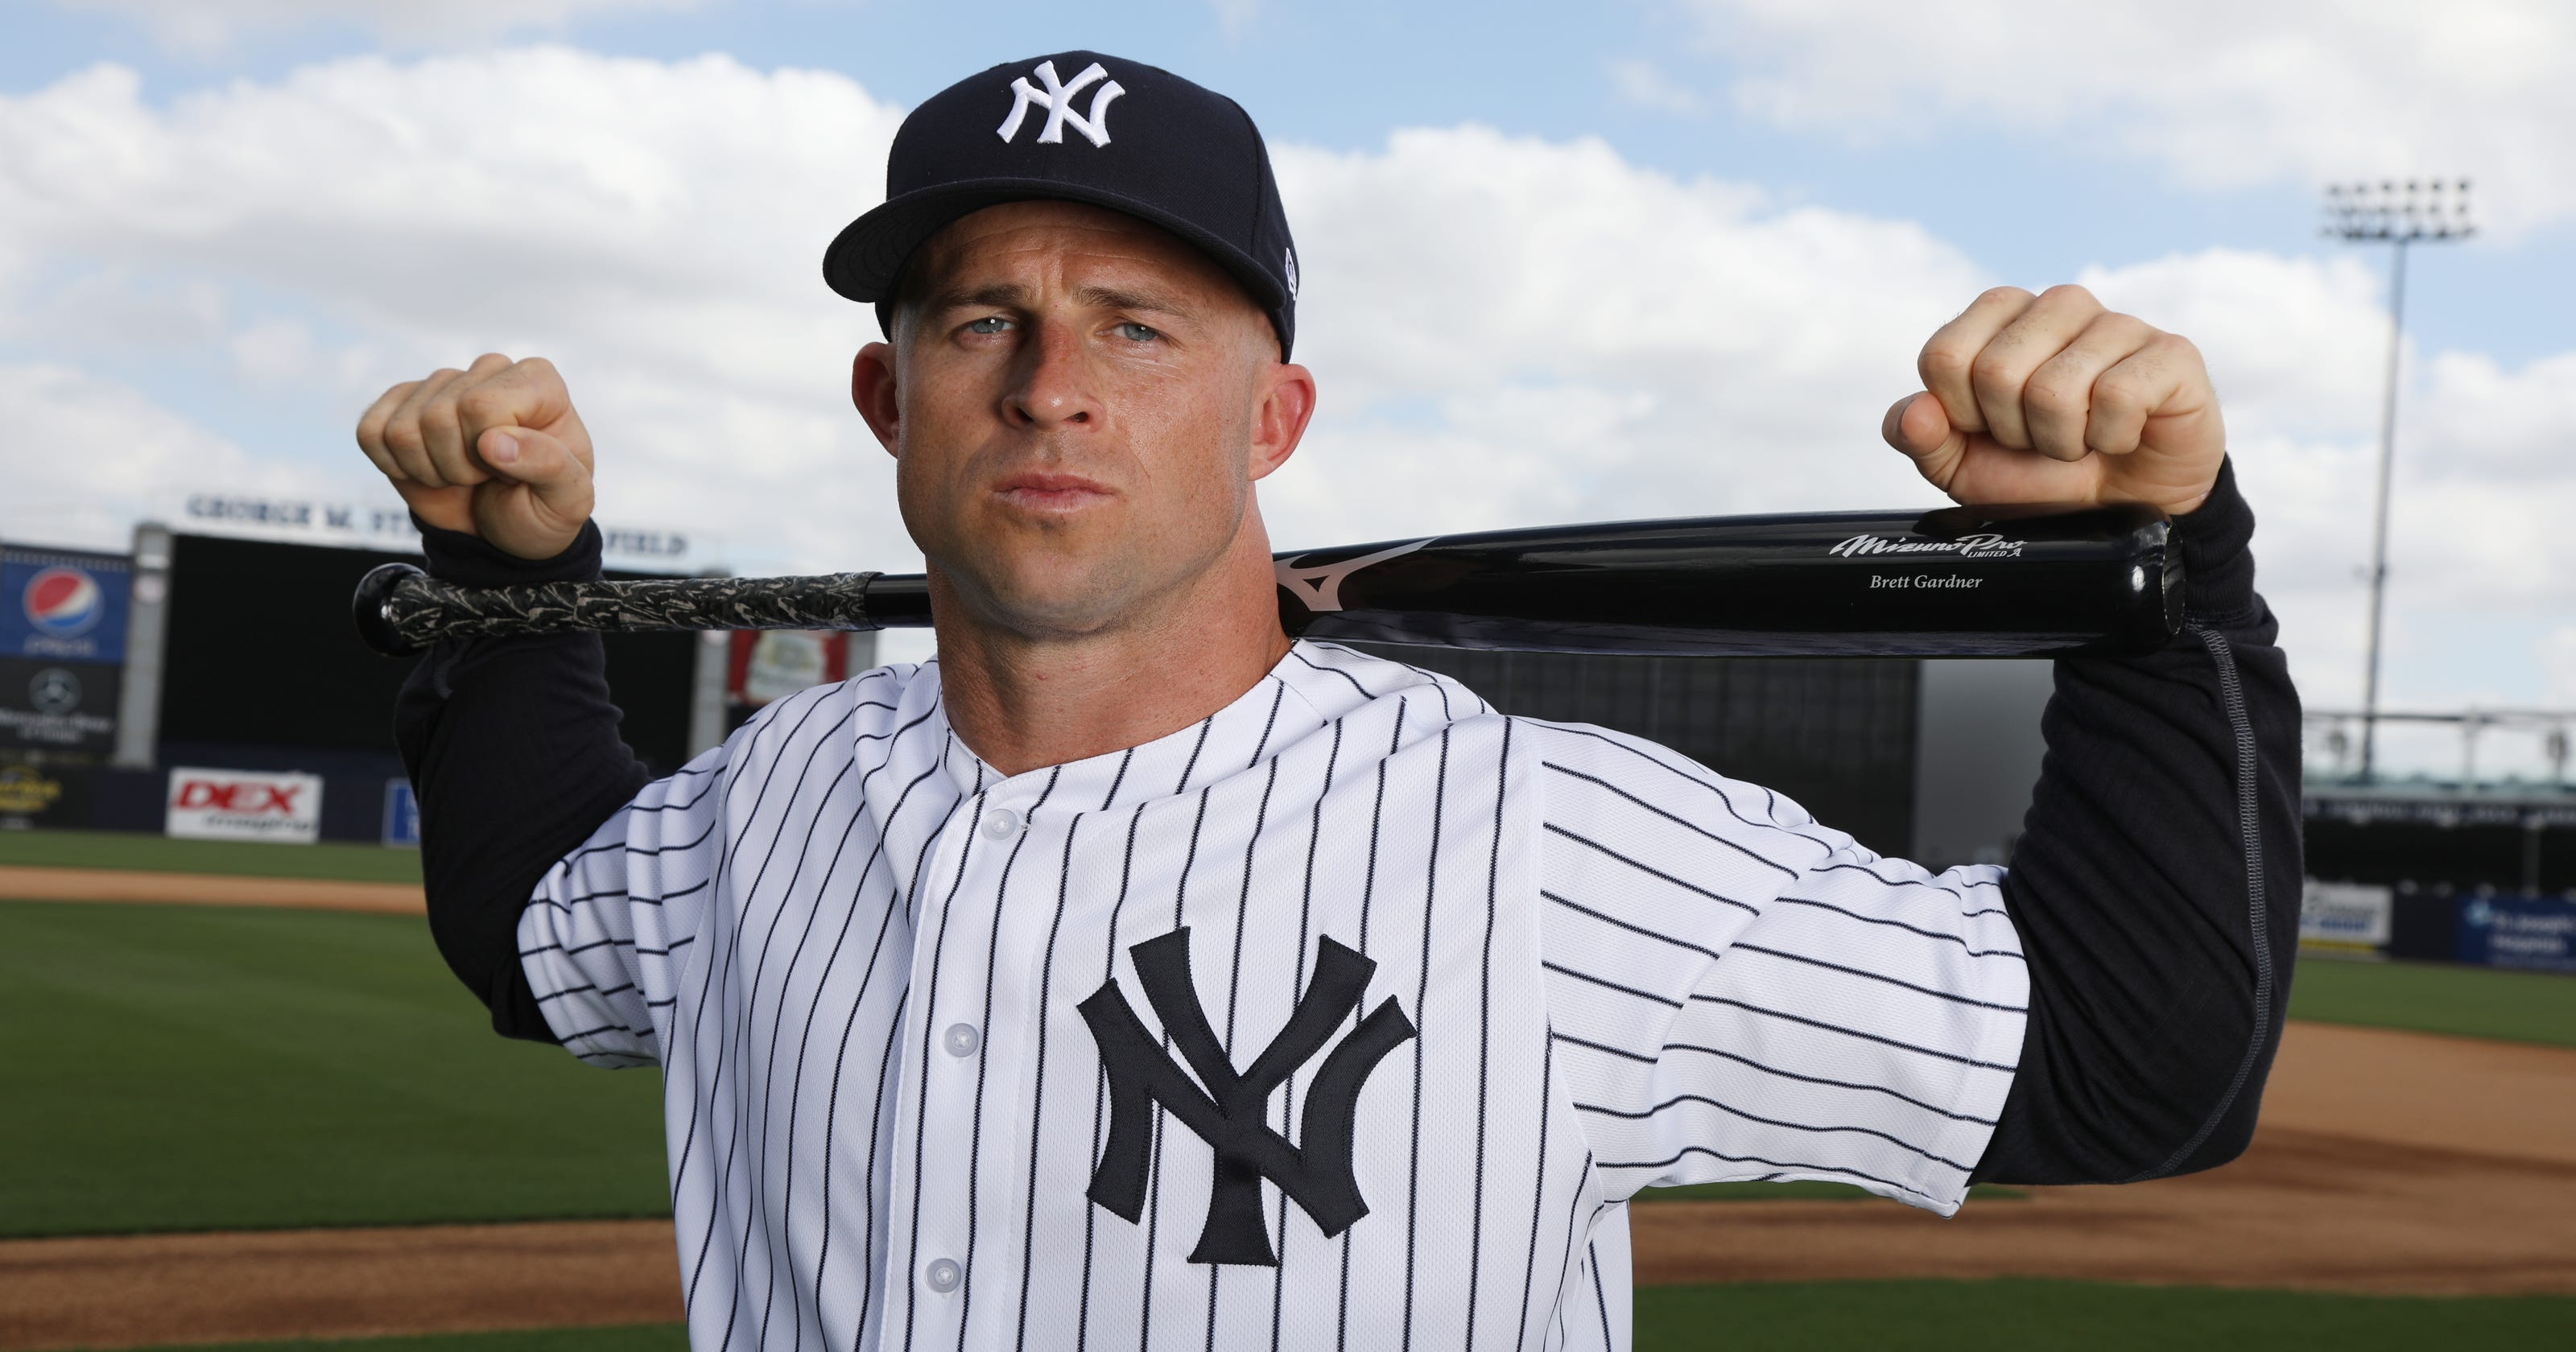 e6a273cd14b65 Popper  In lineup of Yankees sluggers Brett Gardner plays big